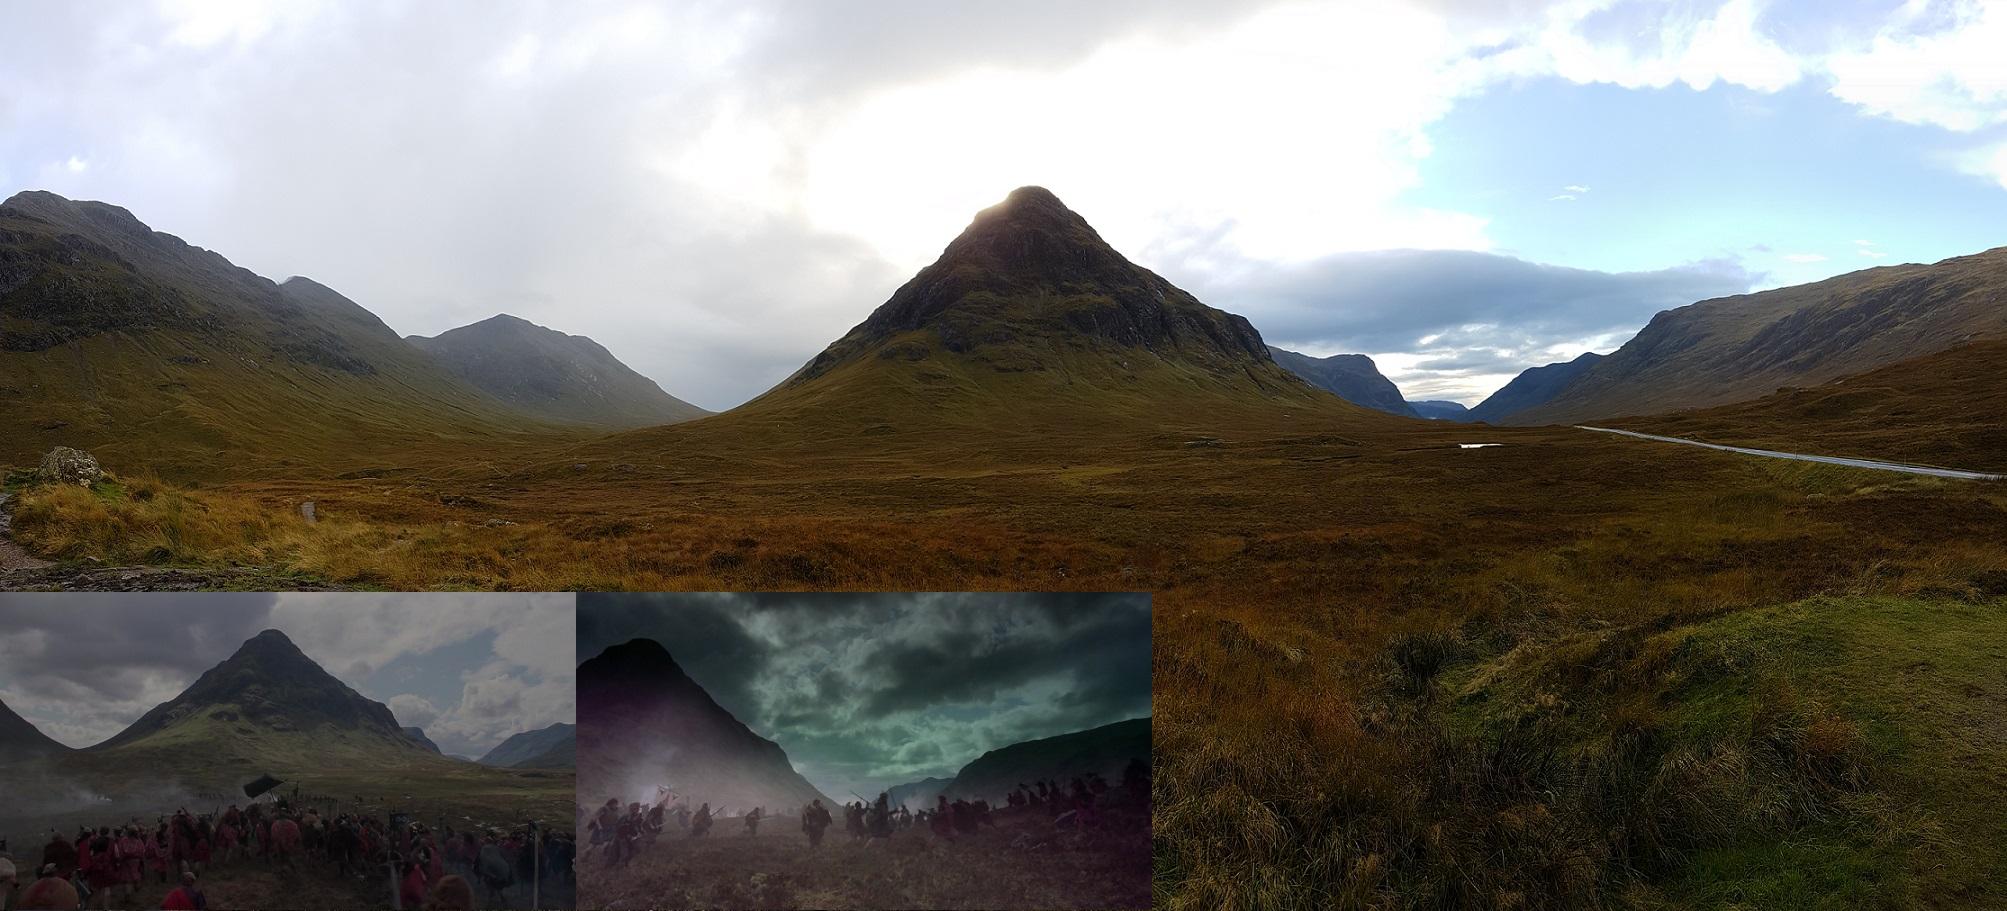 Highlander Imágenes Montagne Buachaille Etive Mor Gps 56 39